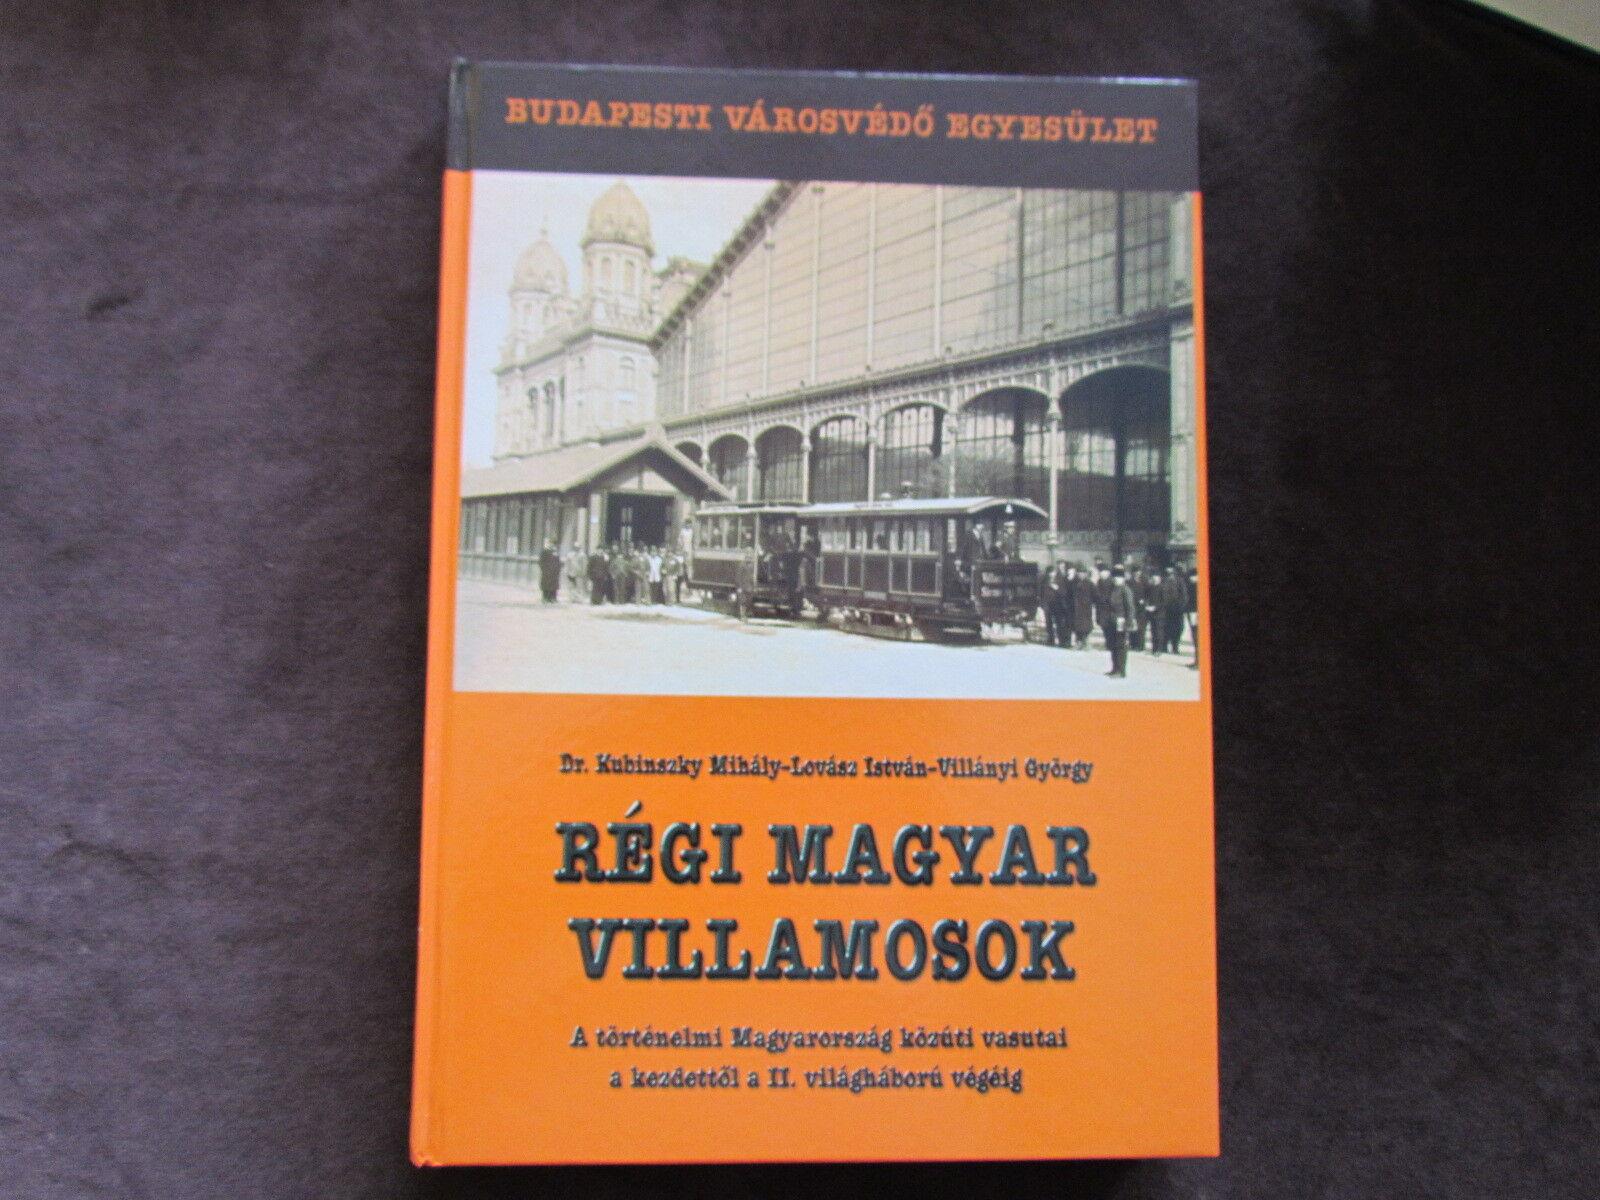 NR 1 - HUNGARY RAILROAD TRAIN BOOK FULL PHOTOS